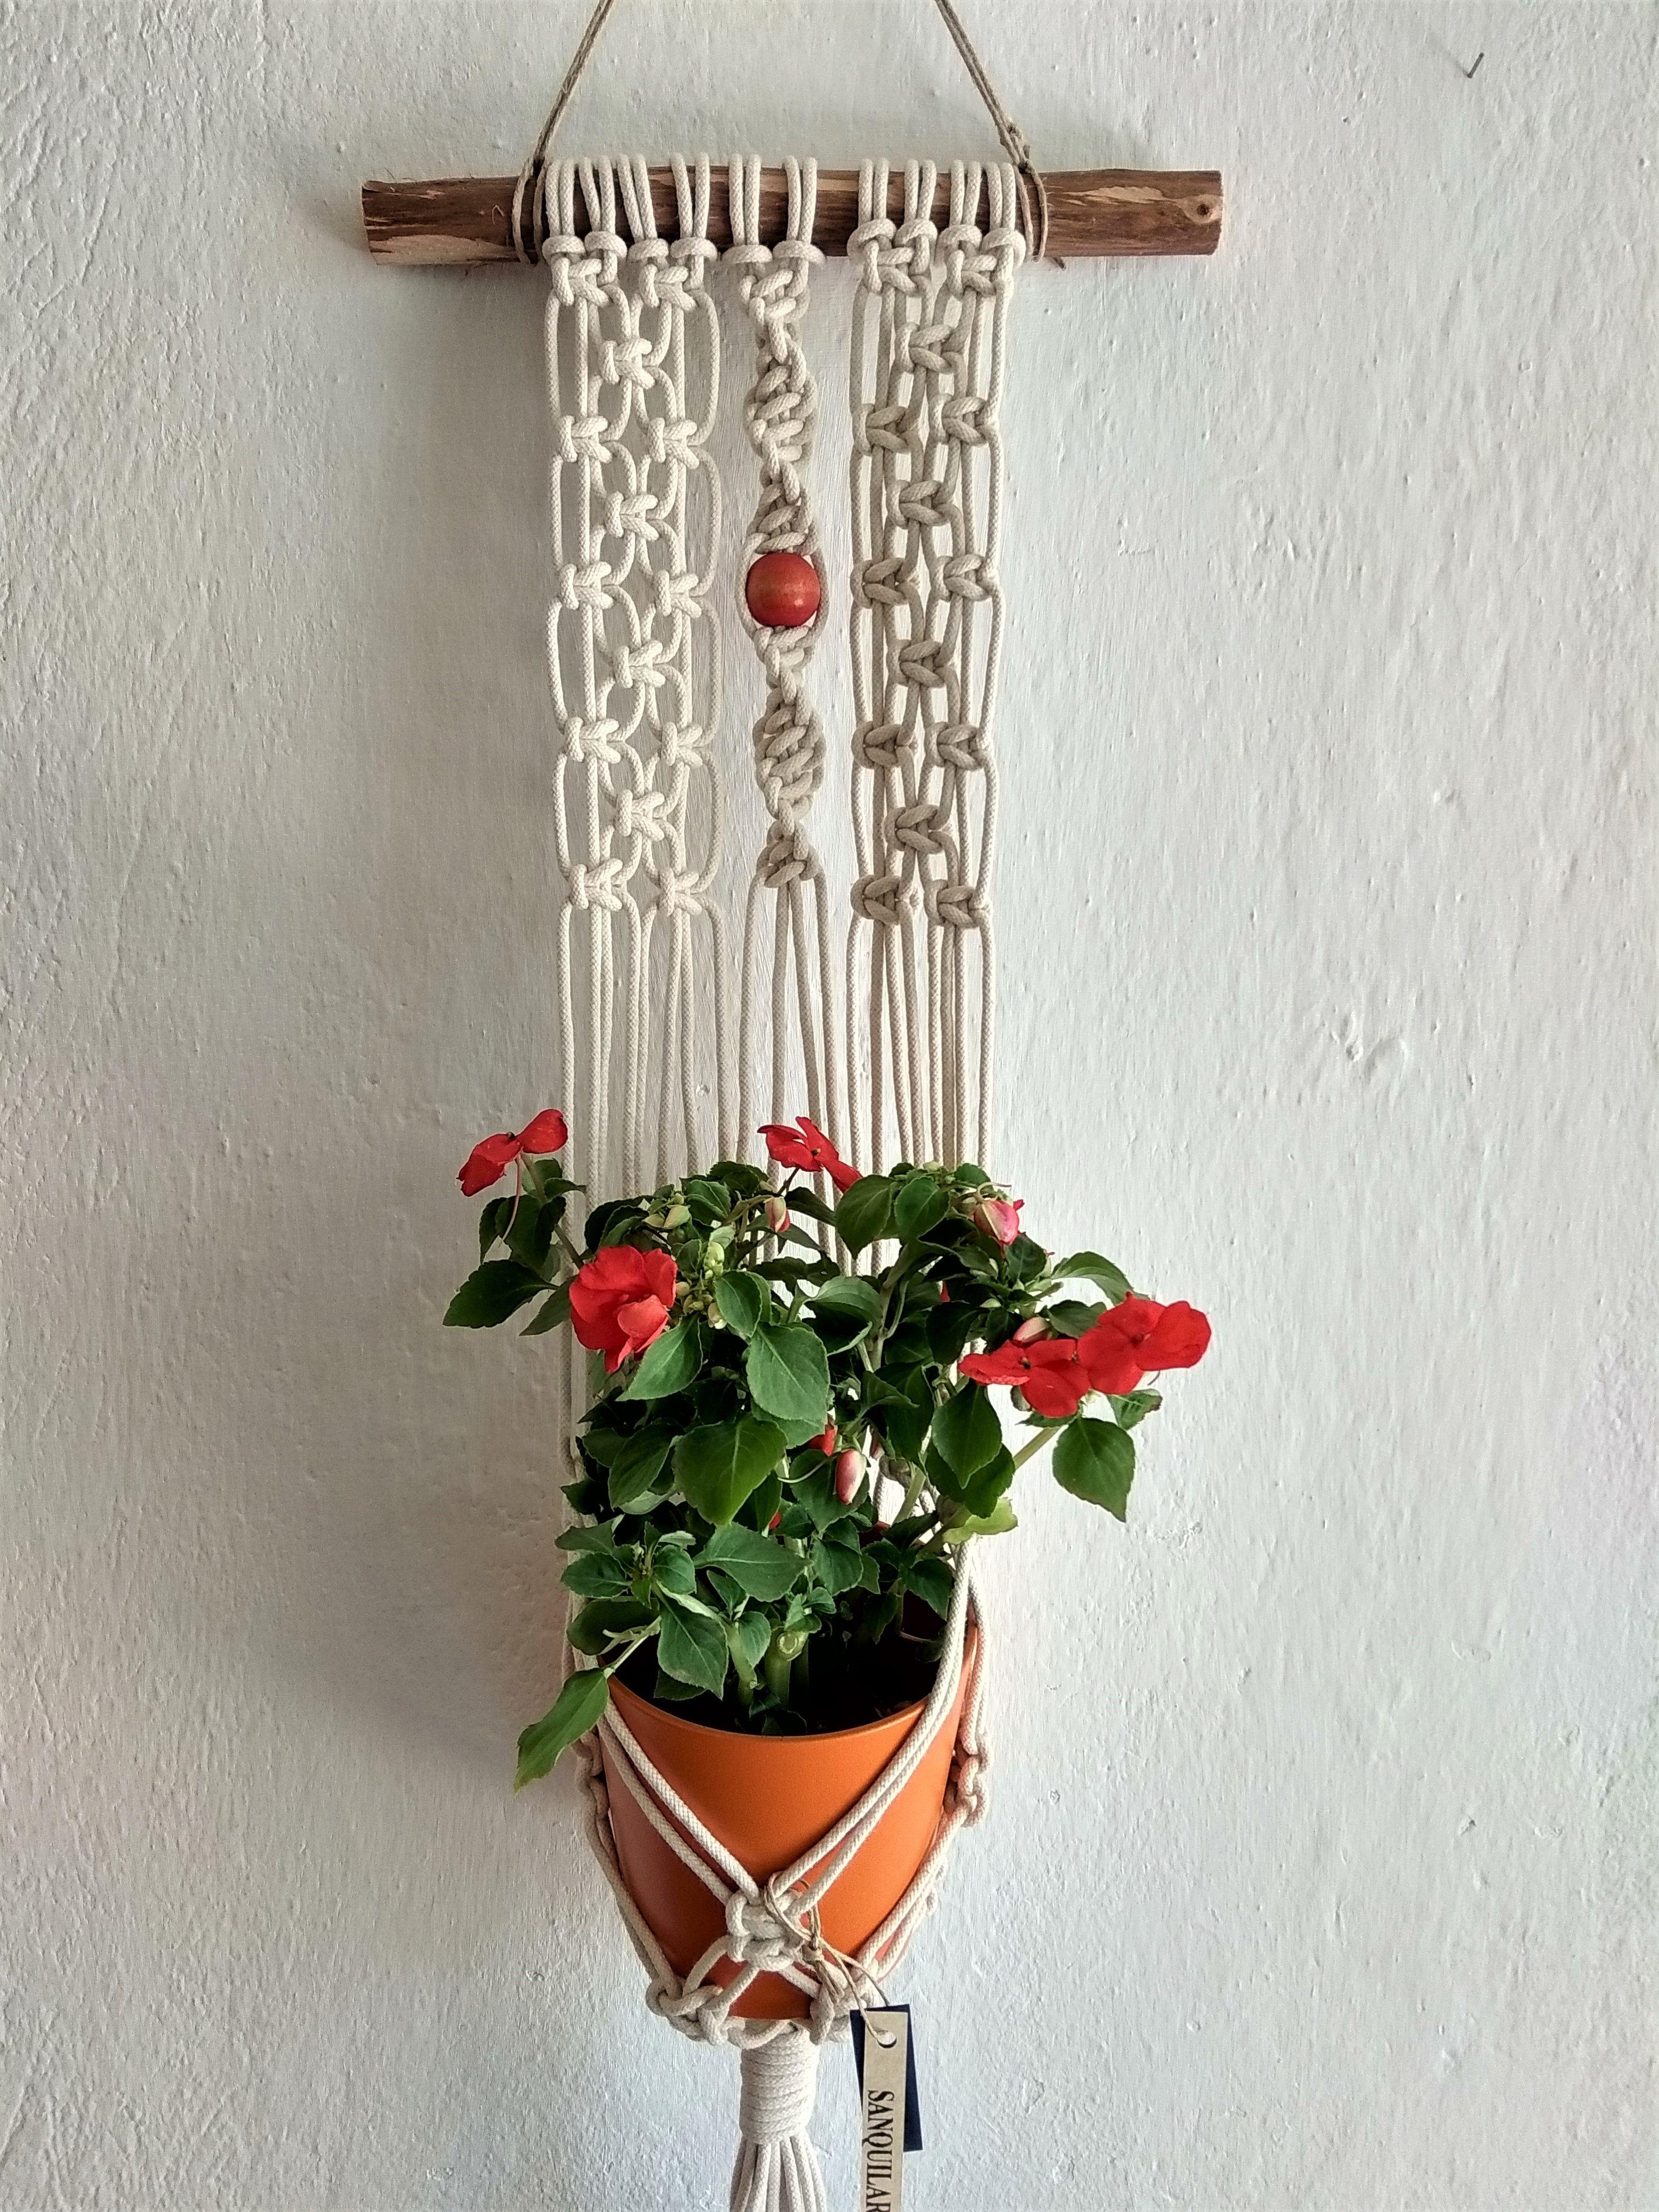 Macrame Plant Holder  Small Succulent Hanger  Modern Home Decor  4-6 Plant Pot  Fiber Art